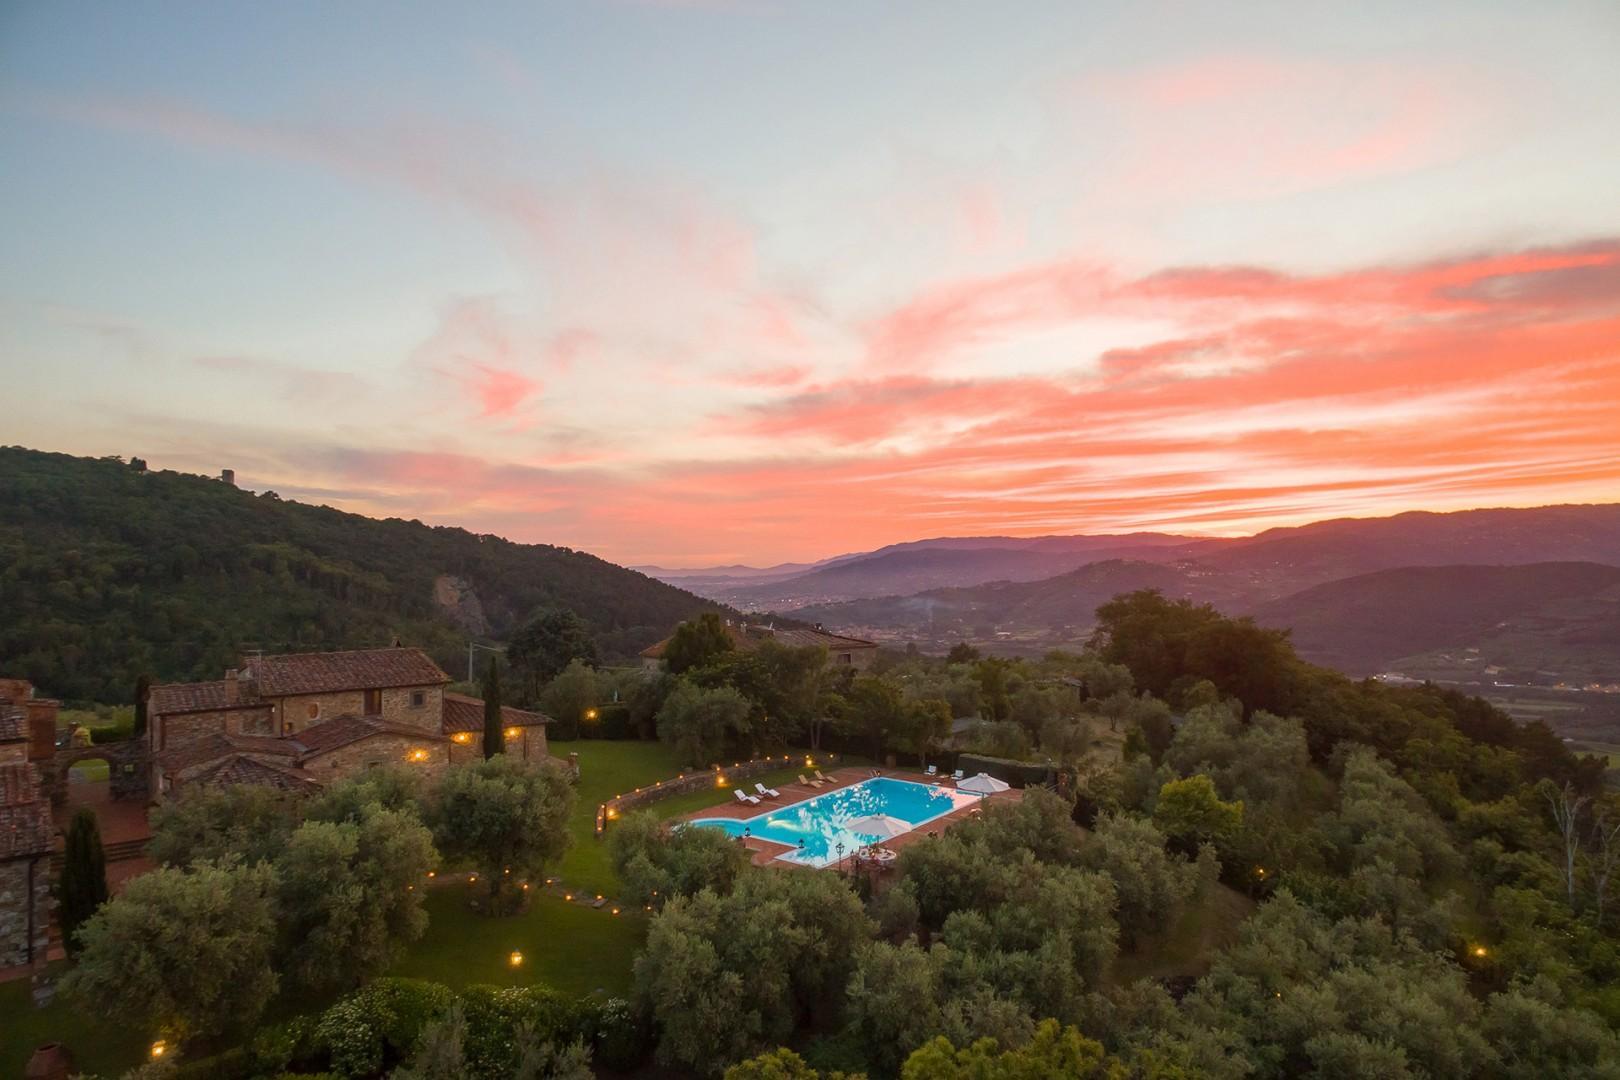 The hilltop vantage point provides wonderful views of Montecatini below.